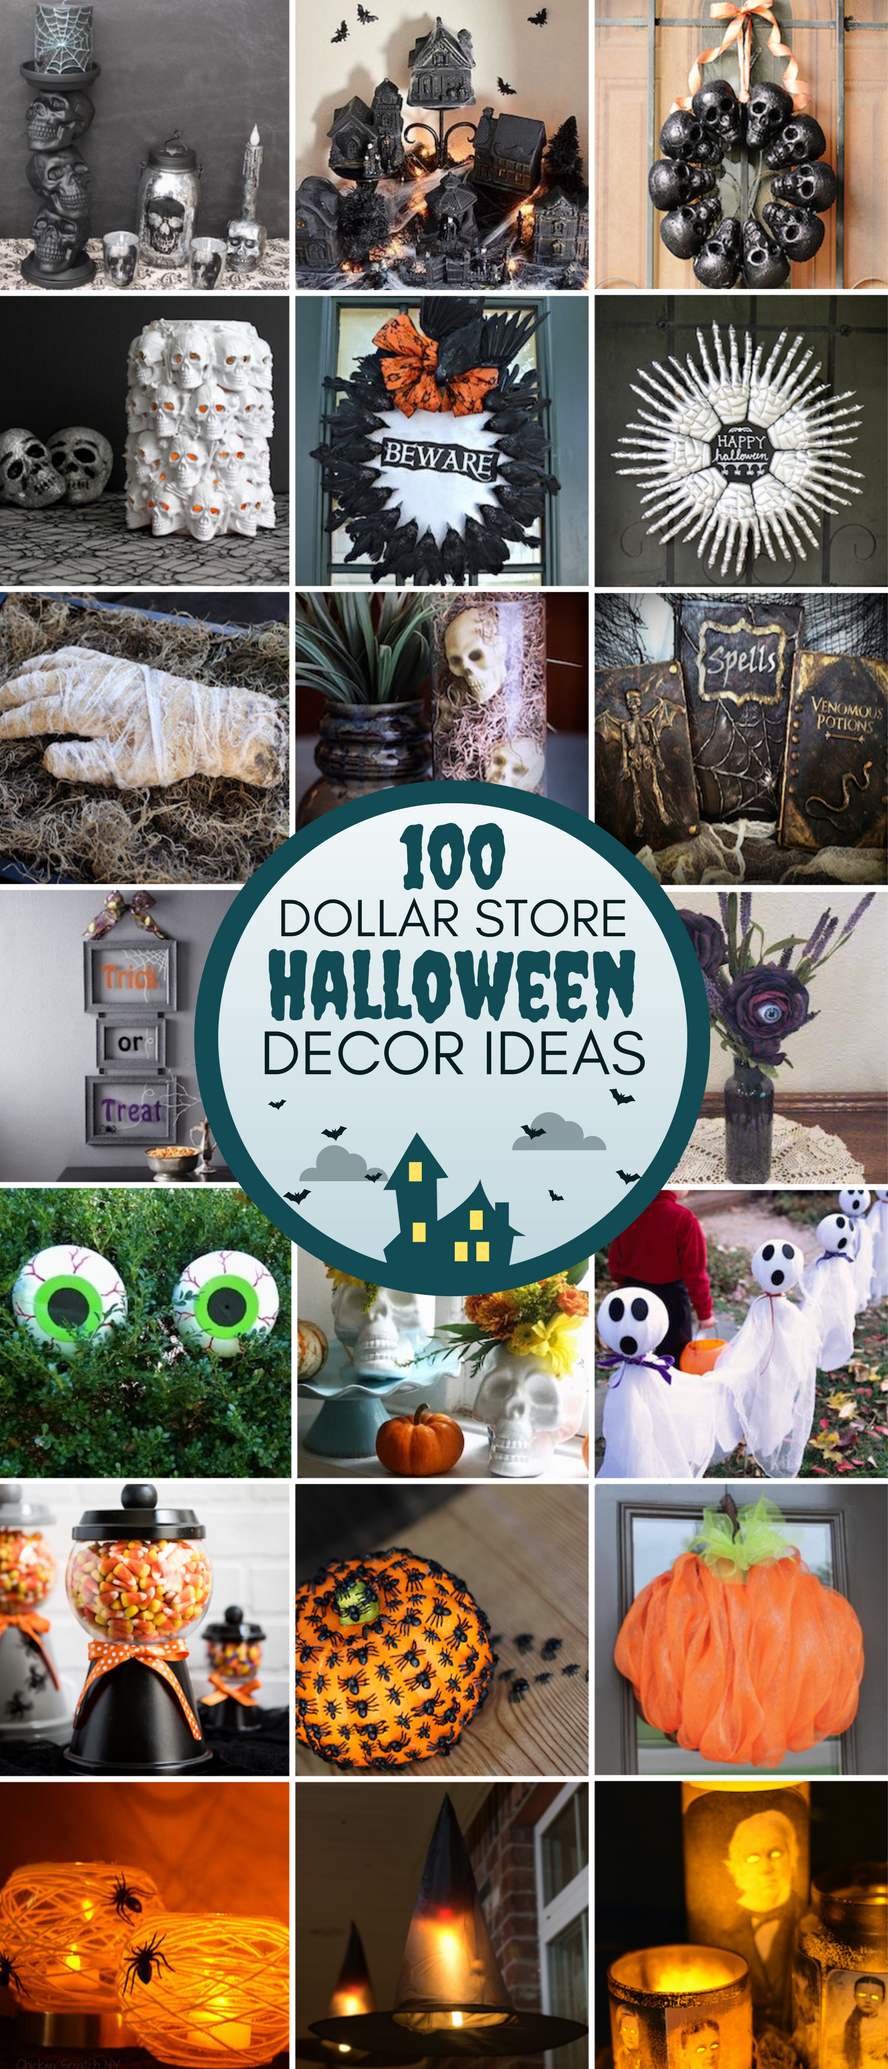 100 Dollar Store Halloween Decorations Dollar Store Halloween Decorations Halloween Decorations Diy Outdoor Dollar Store Halloween